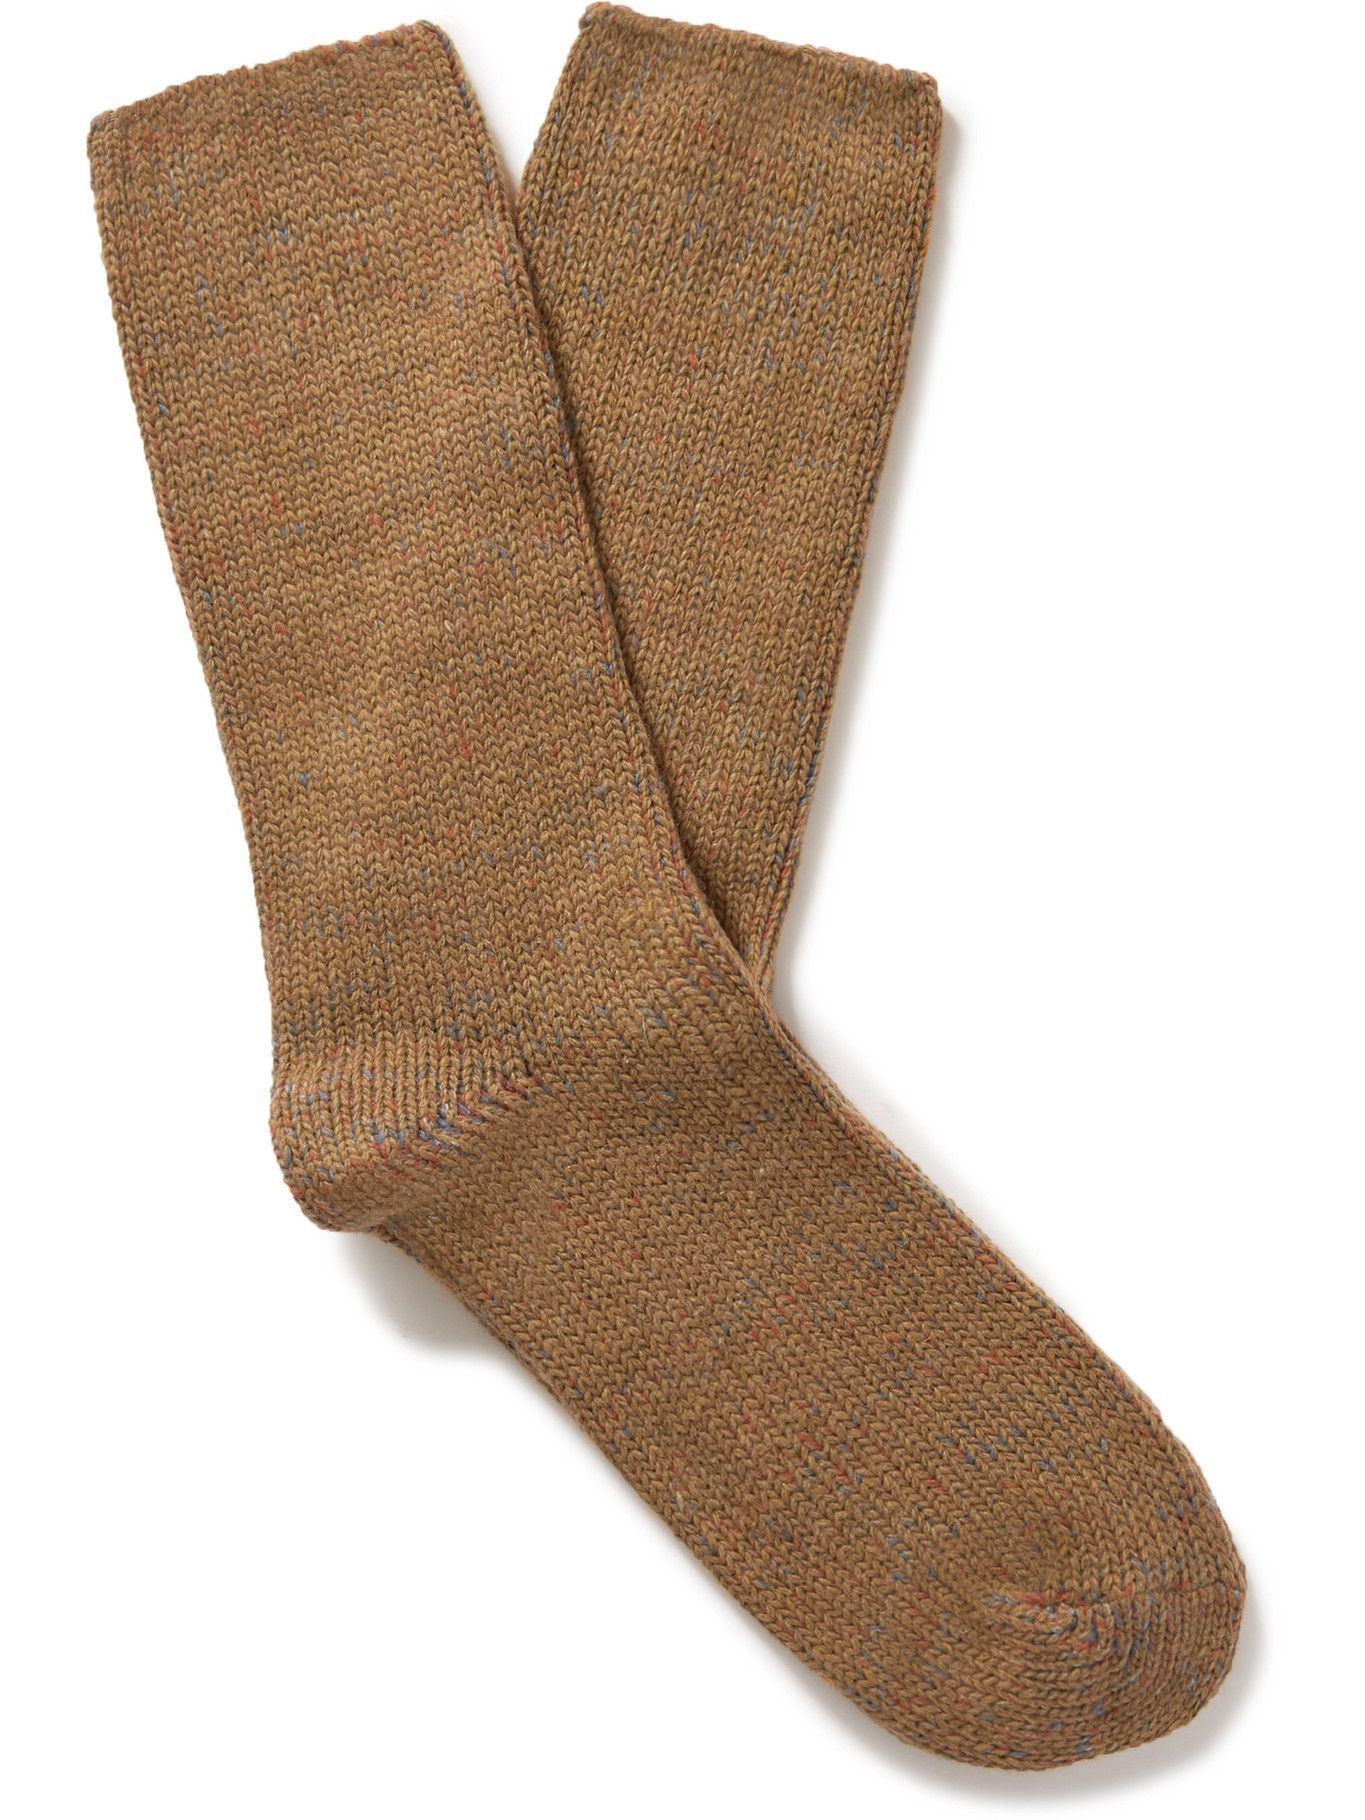 Photo: Thunders Love - Recycled Wool-Blend Socks